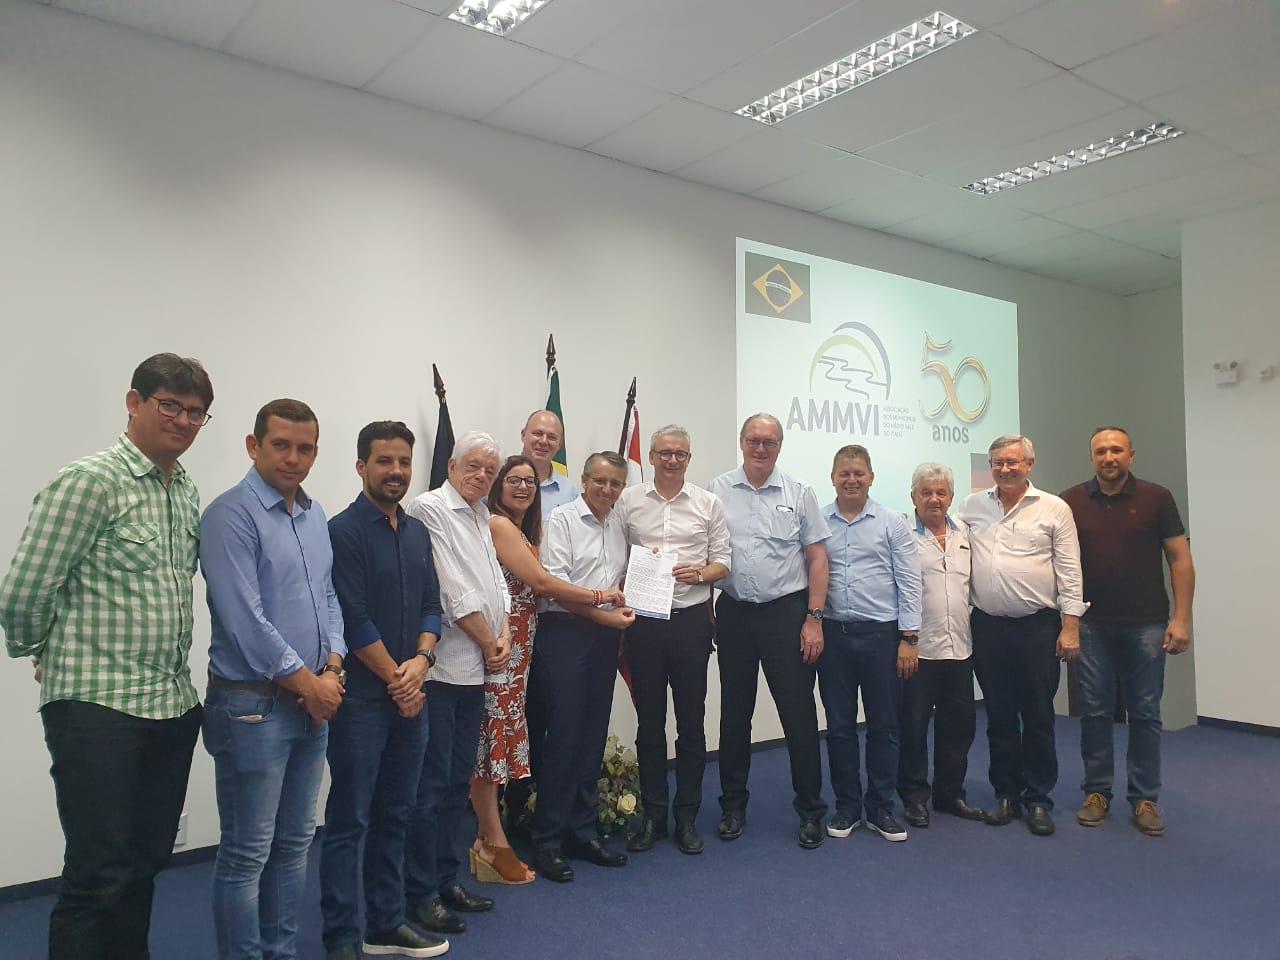 Comitiva de Karlsruhe visita AMMVI a convite de Brusque